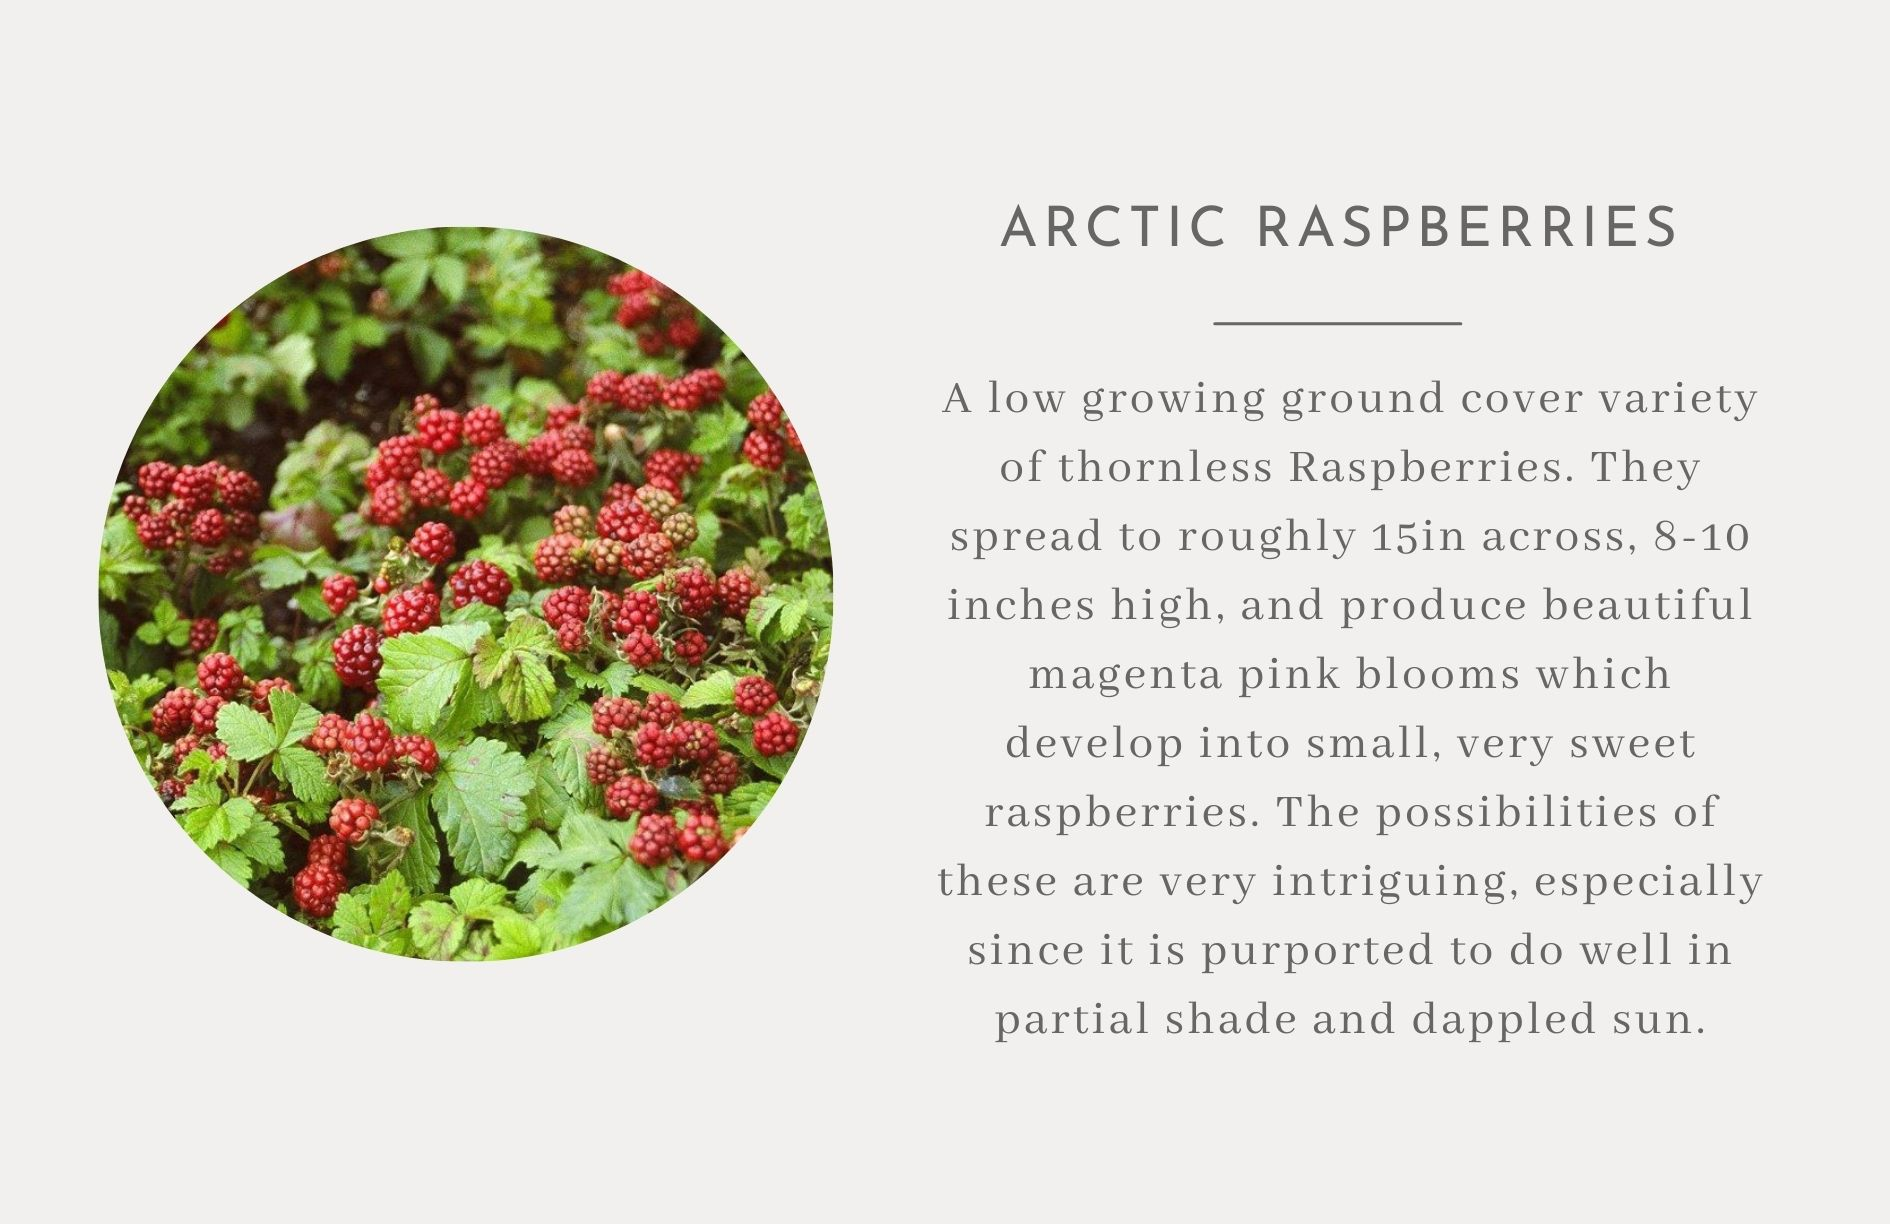 Arctic Raspberries - Edible landscape ideas